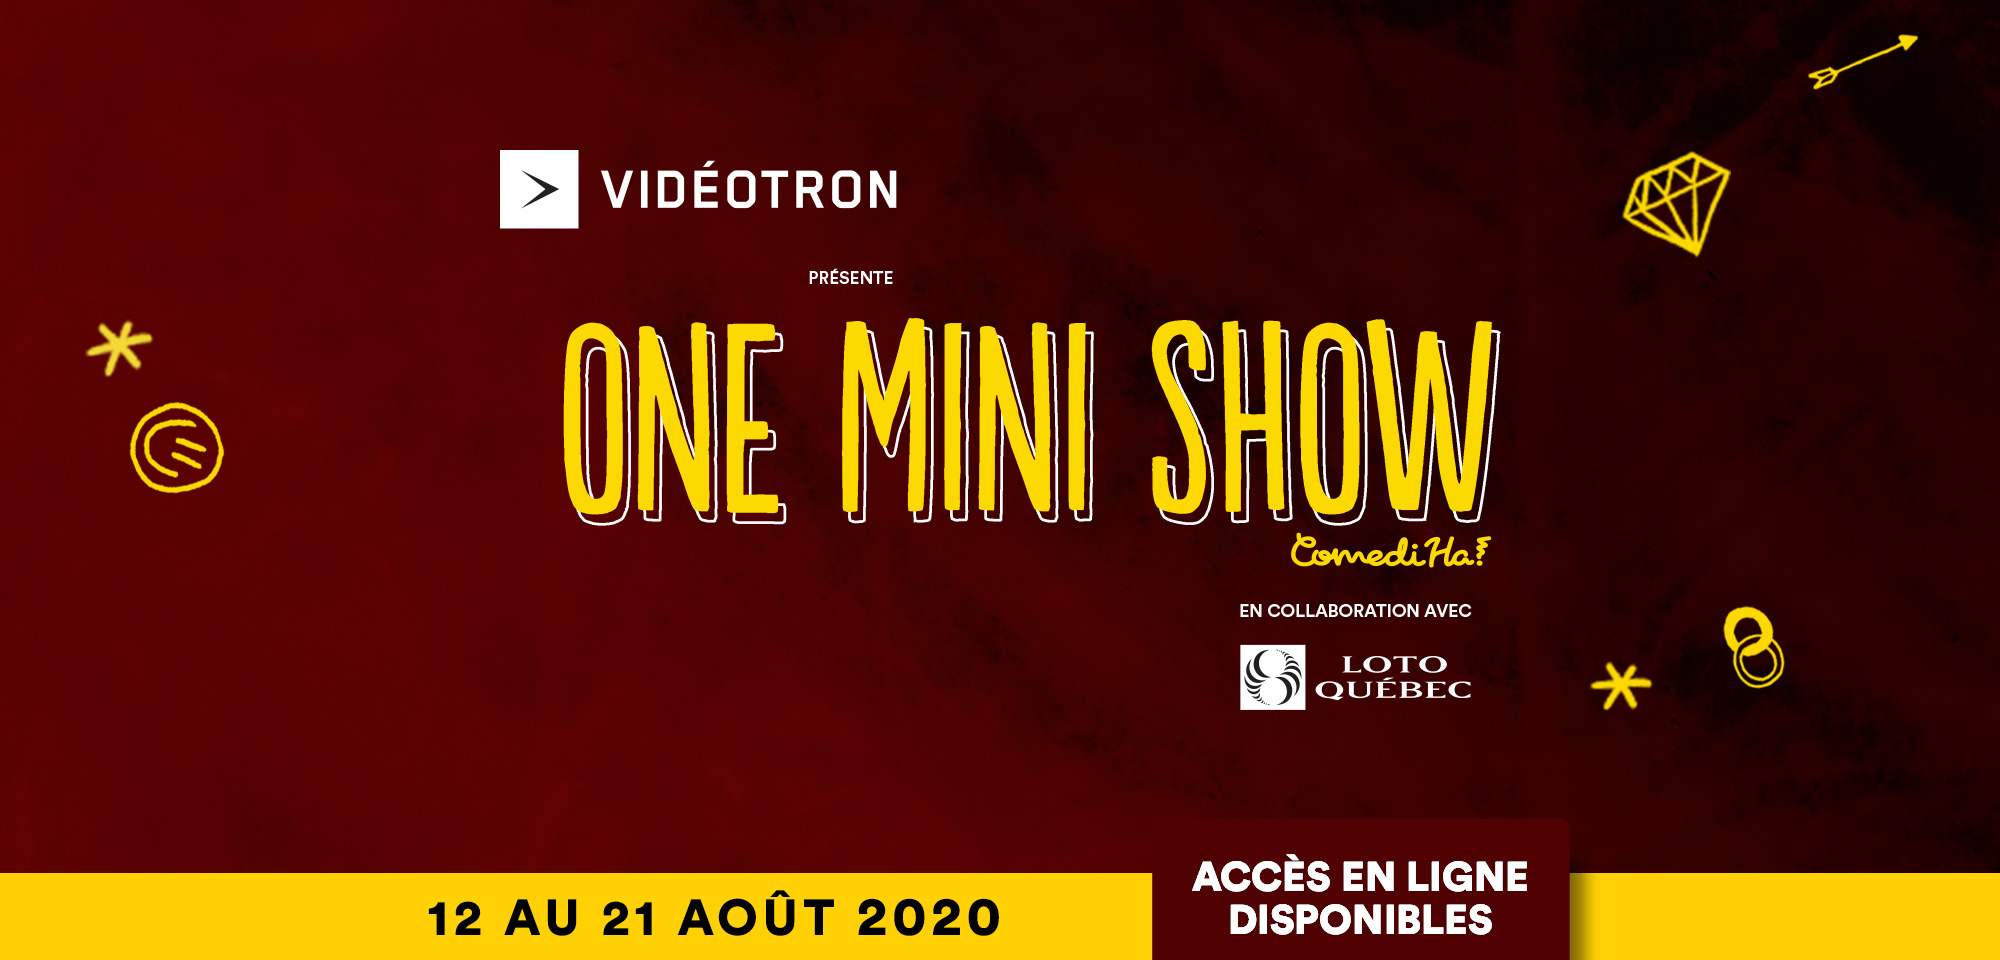 One Mini Show